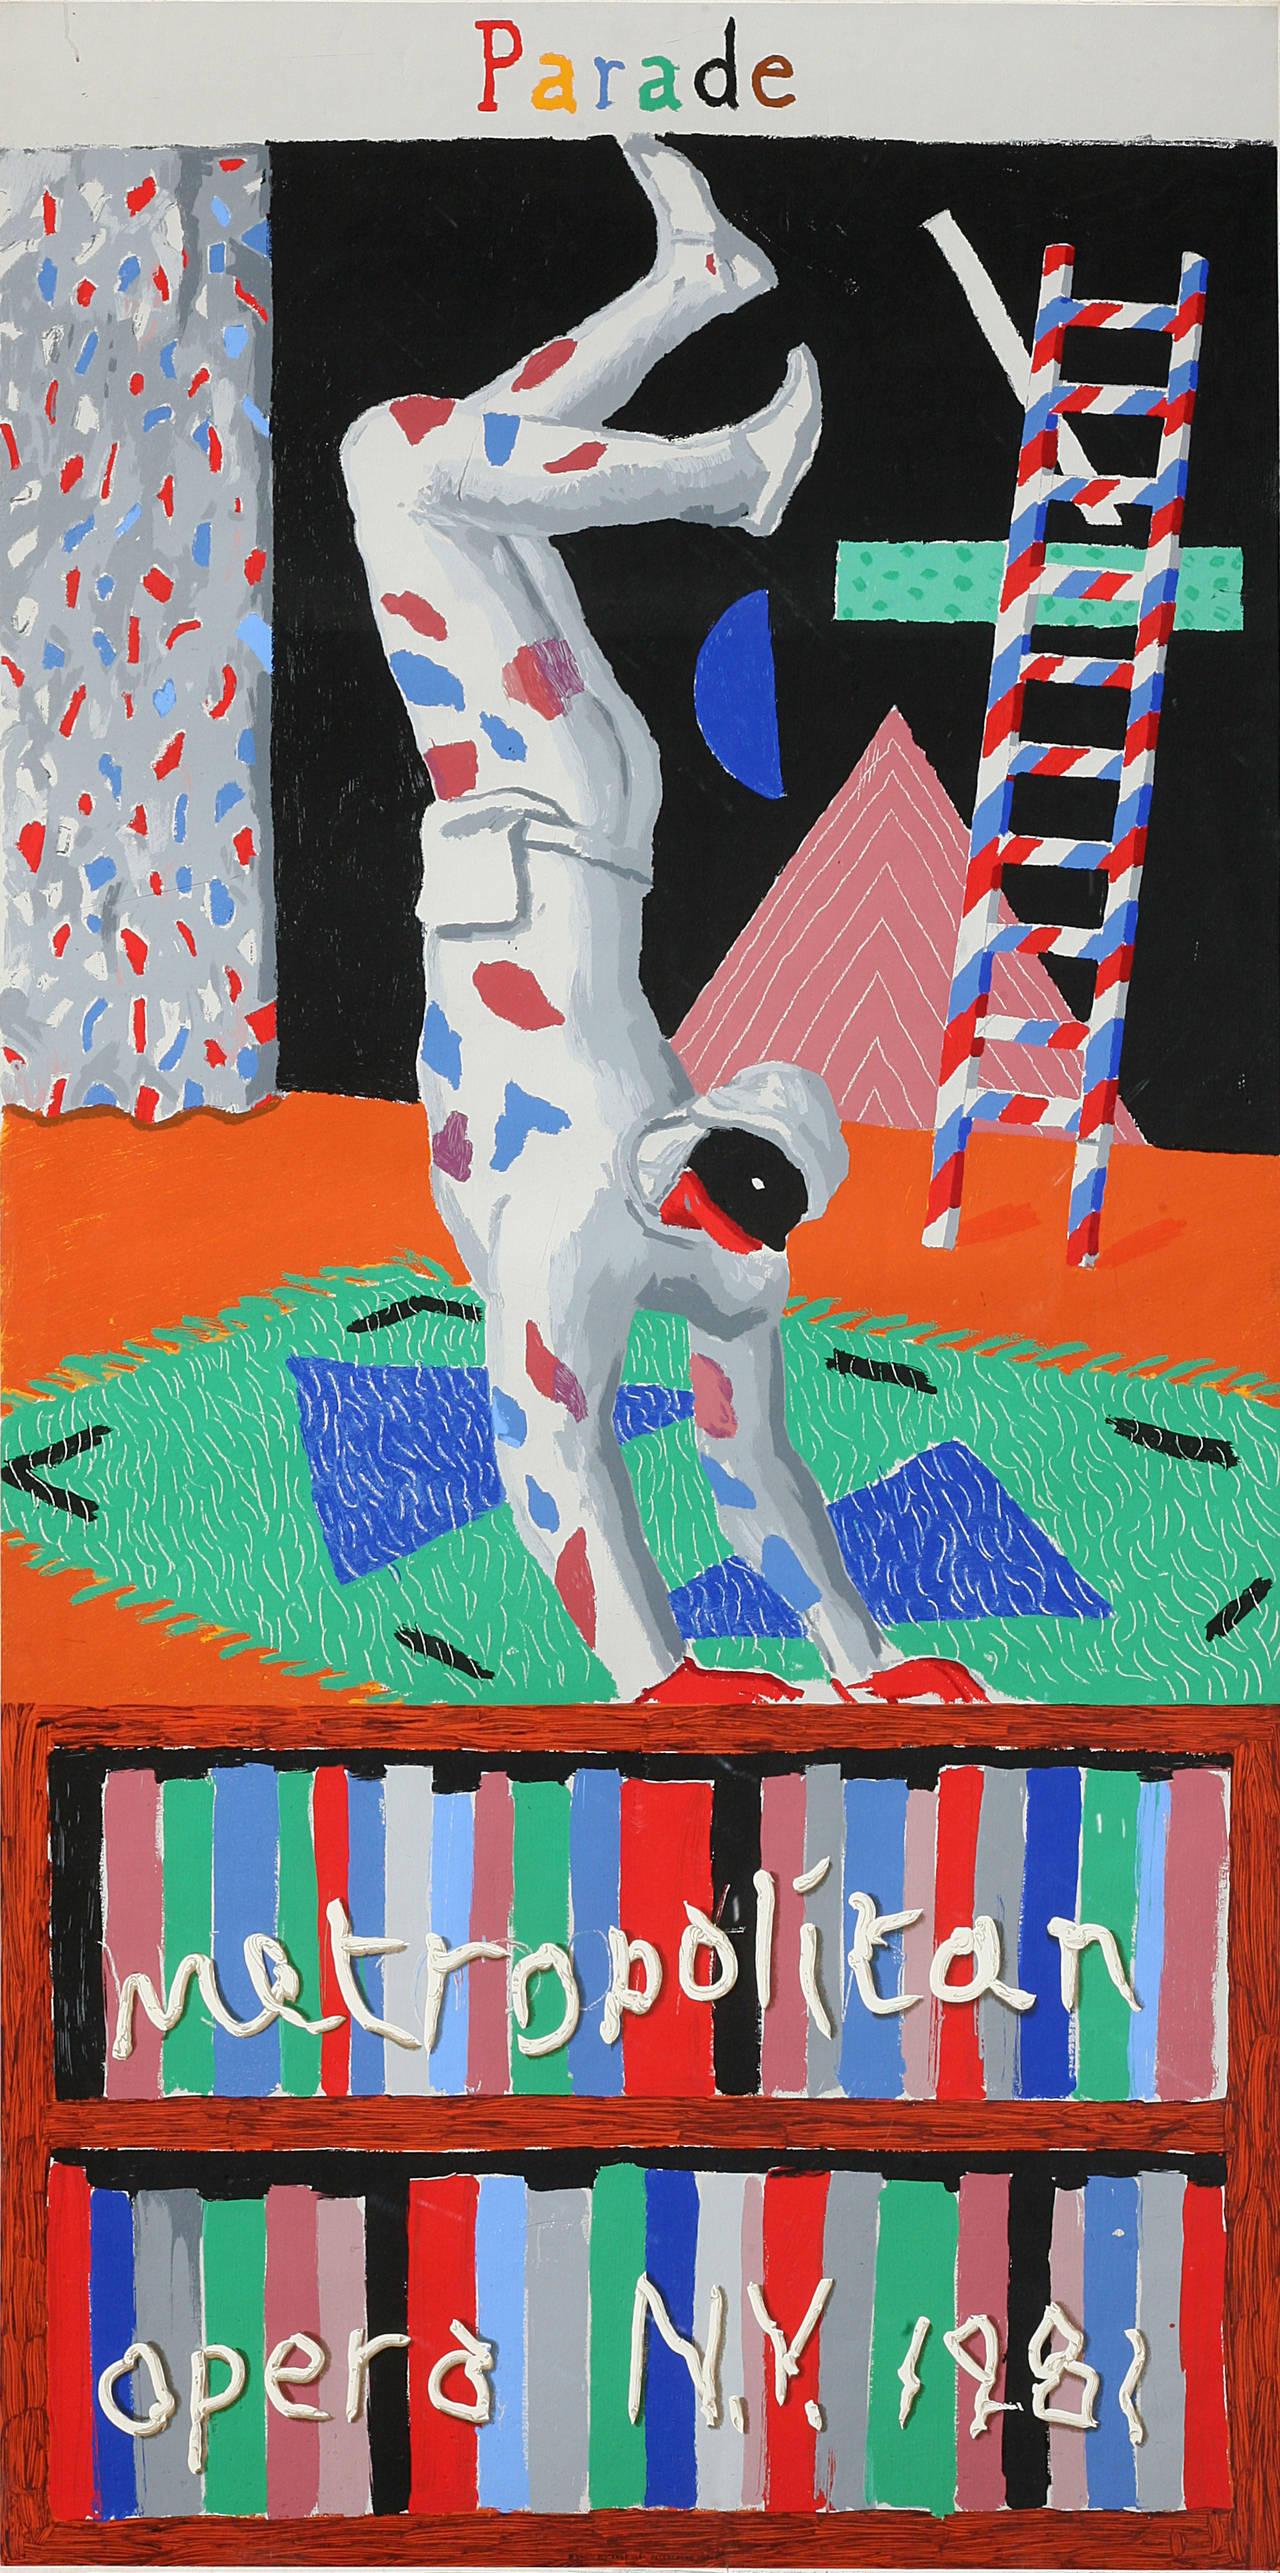 David Hockney Figurative Print - Parade Metropolitan Opera 1981